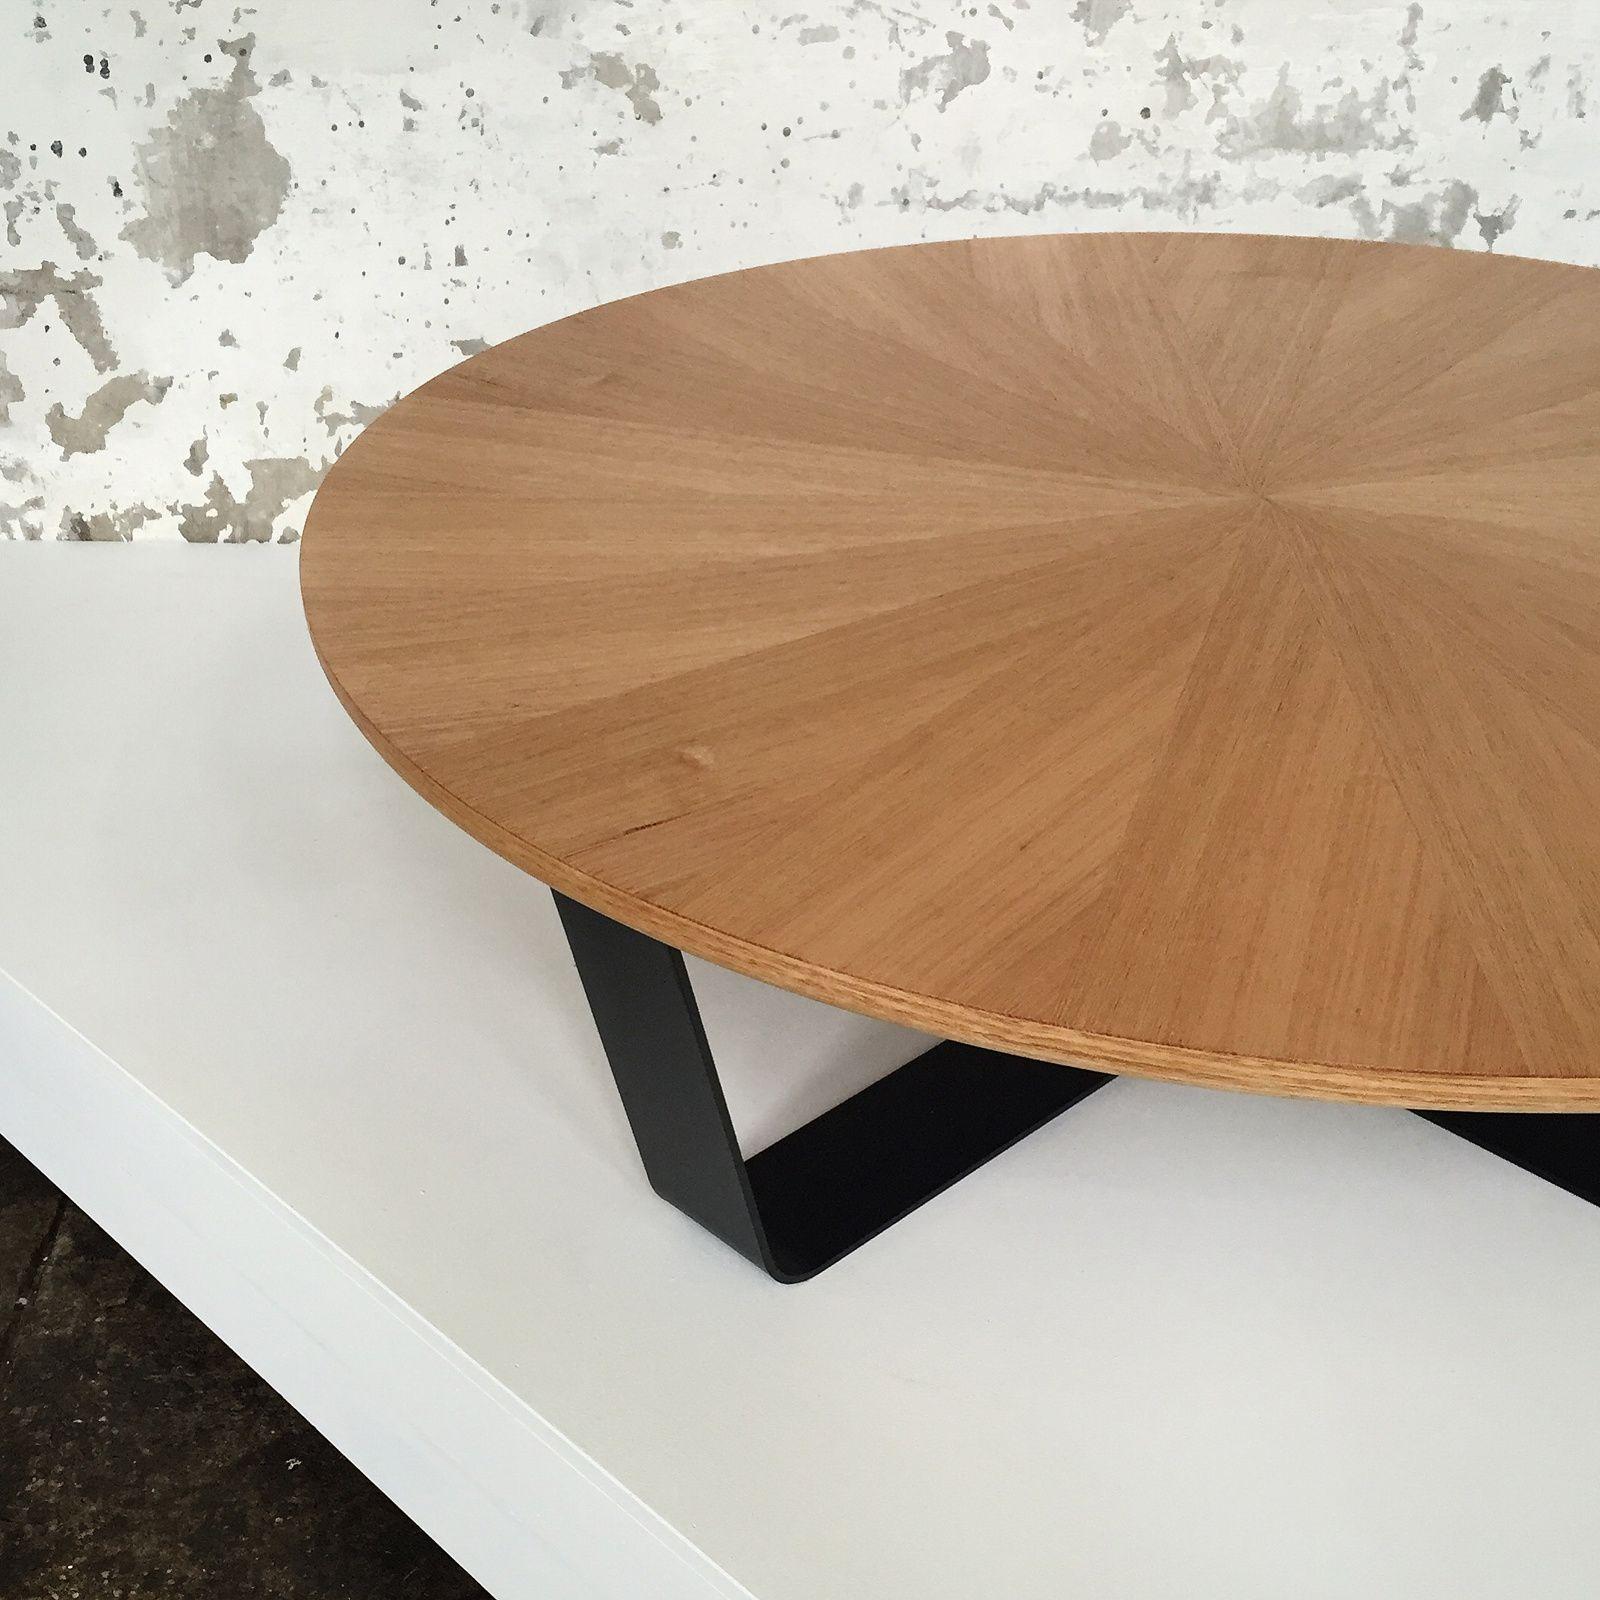 Simon Ancher Studio sunburst coffee table in Tasmanian oak